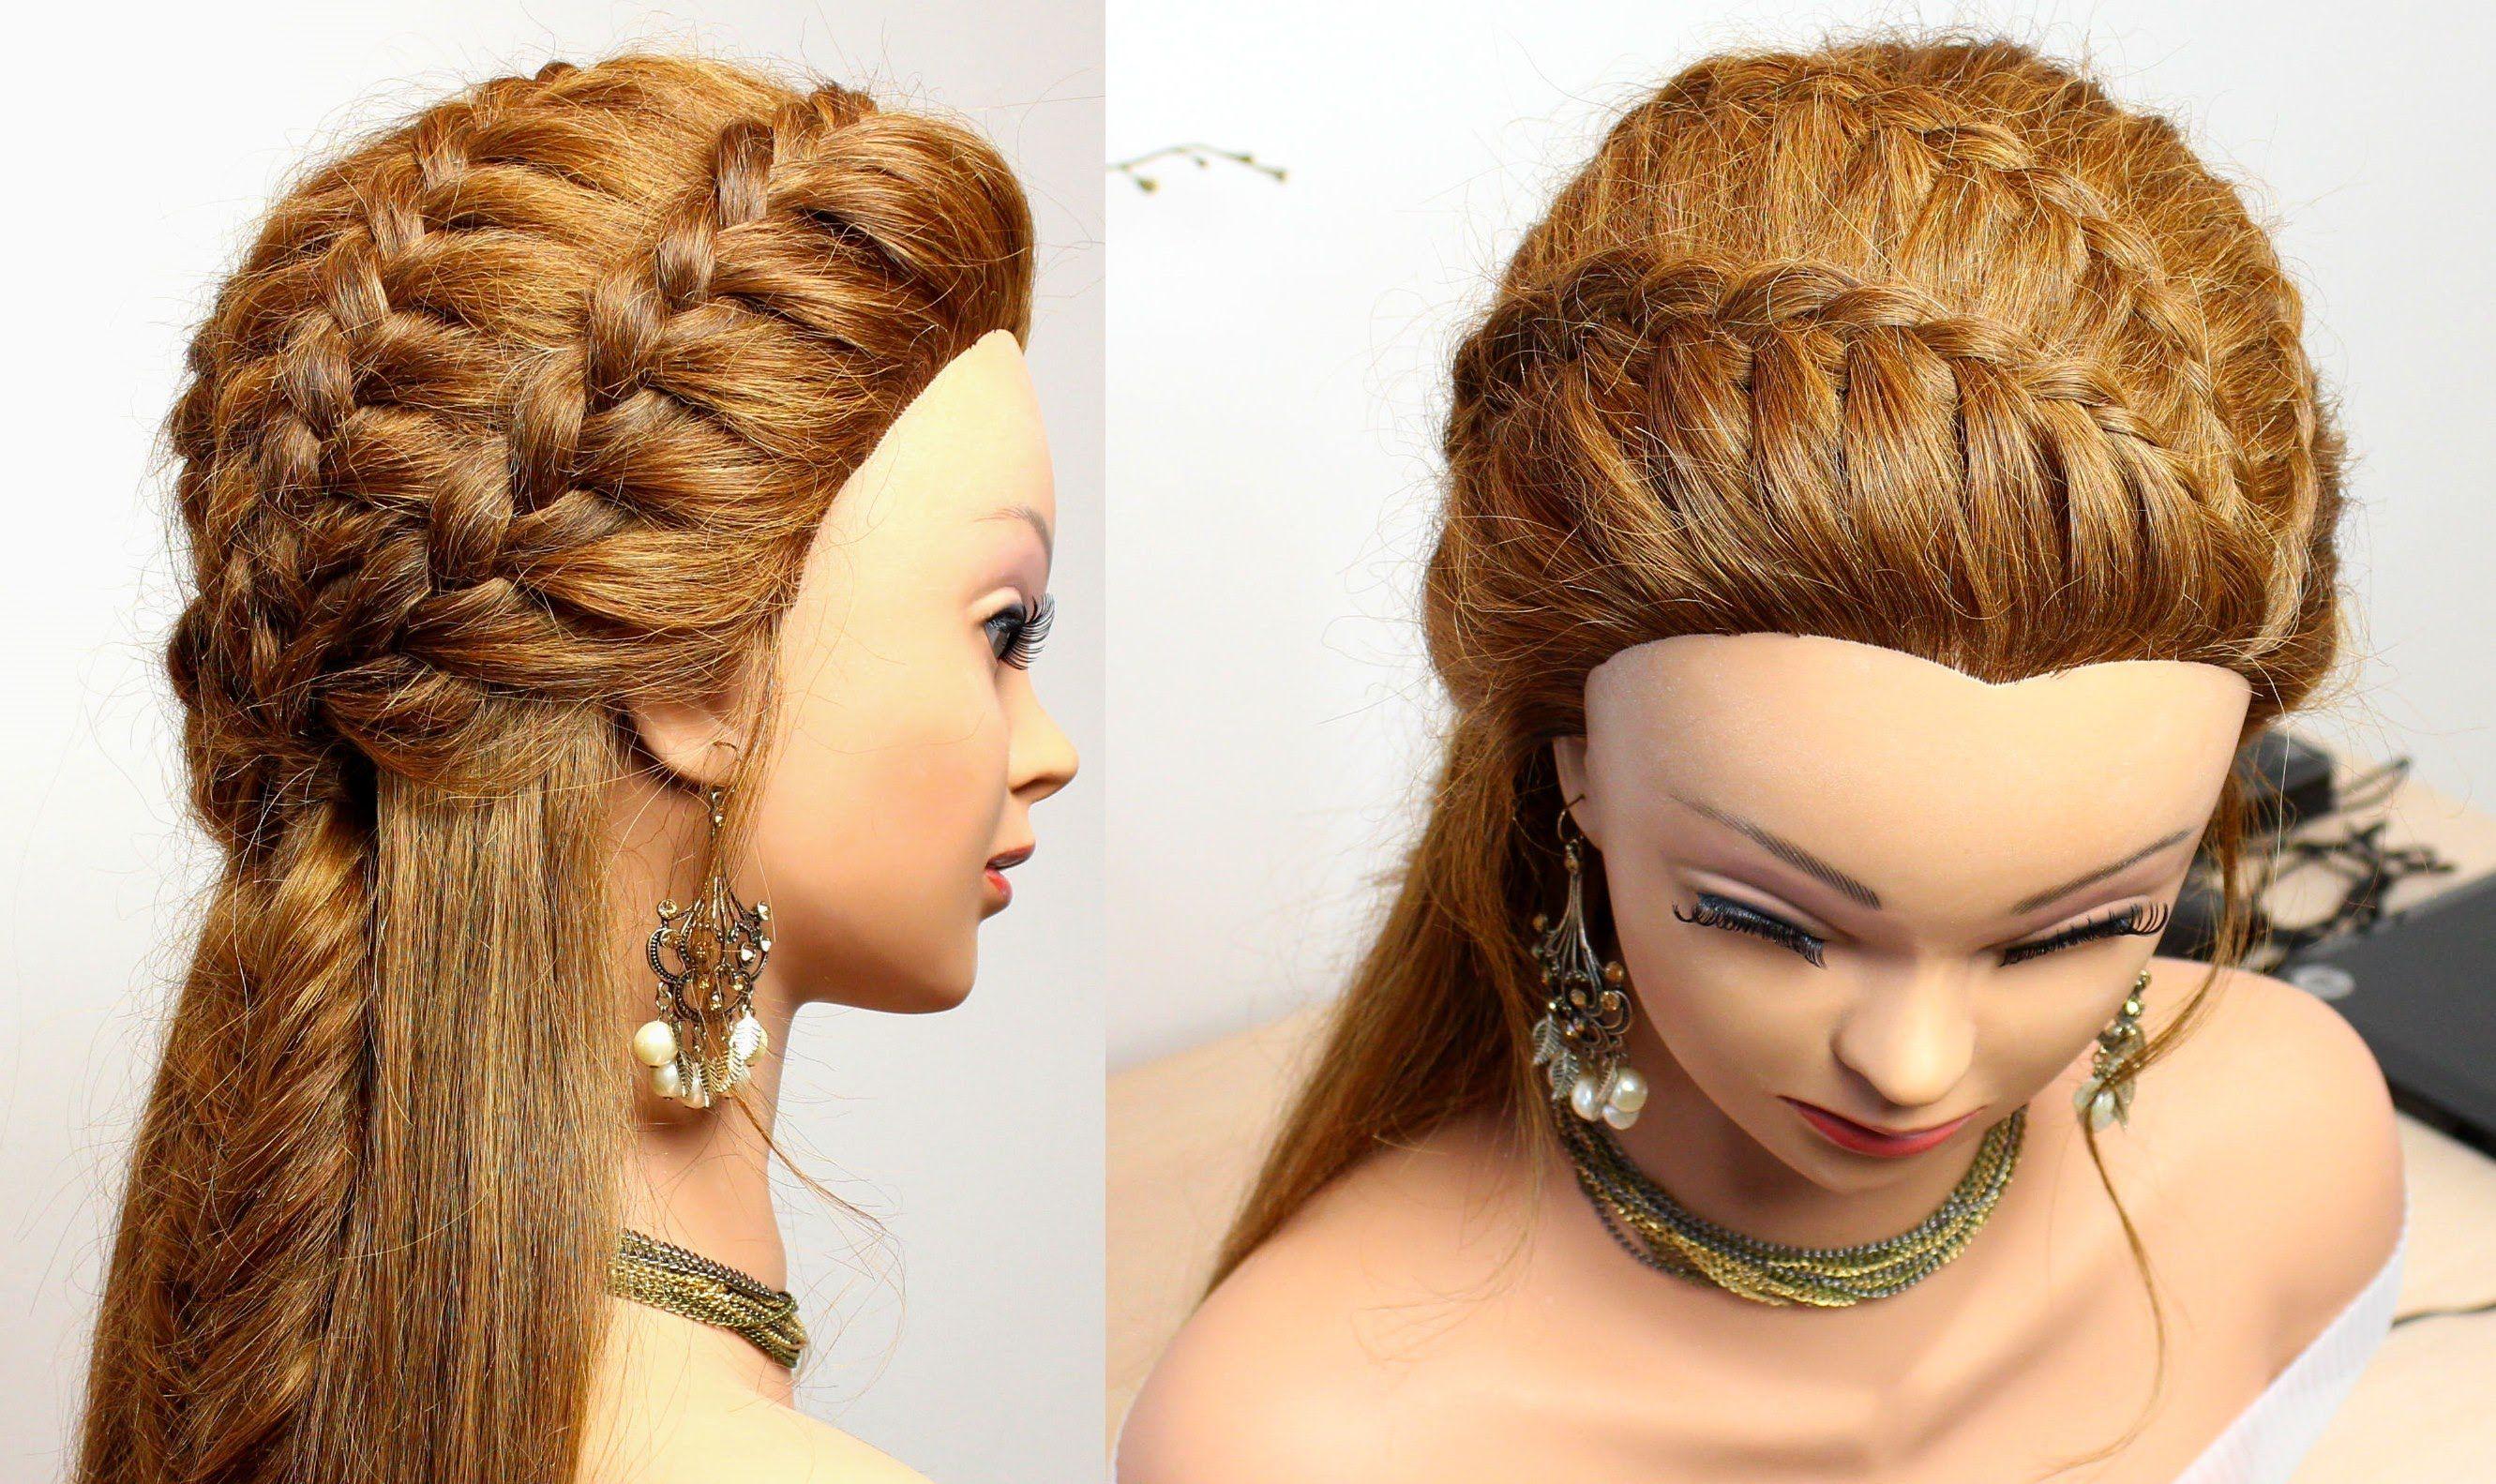 Hairstyle for medium long hair Easy braids tutorial make up